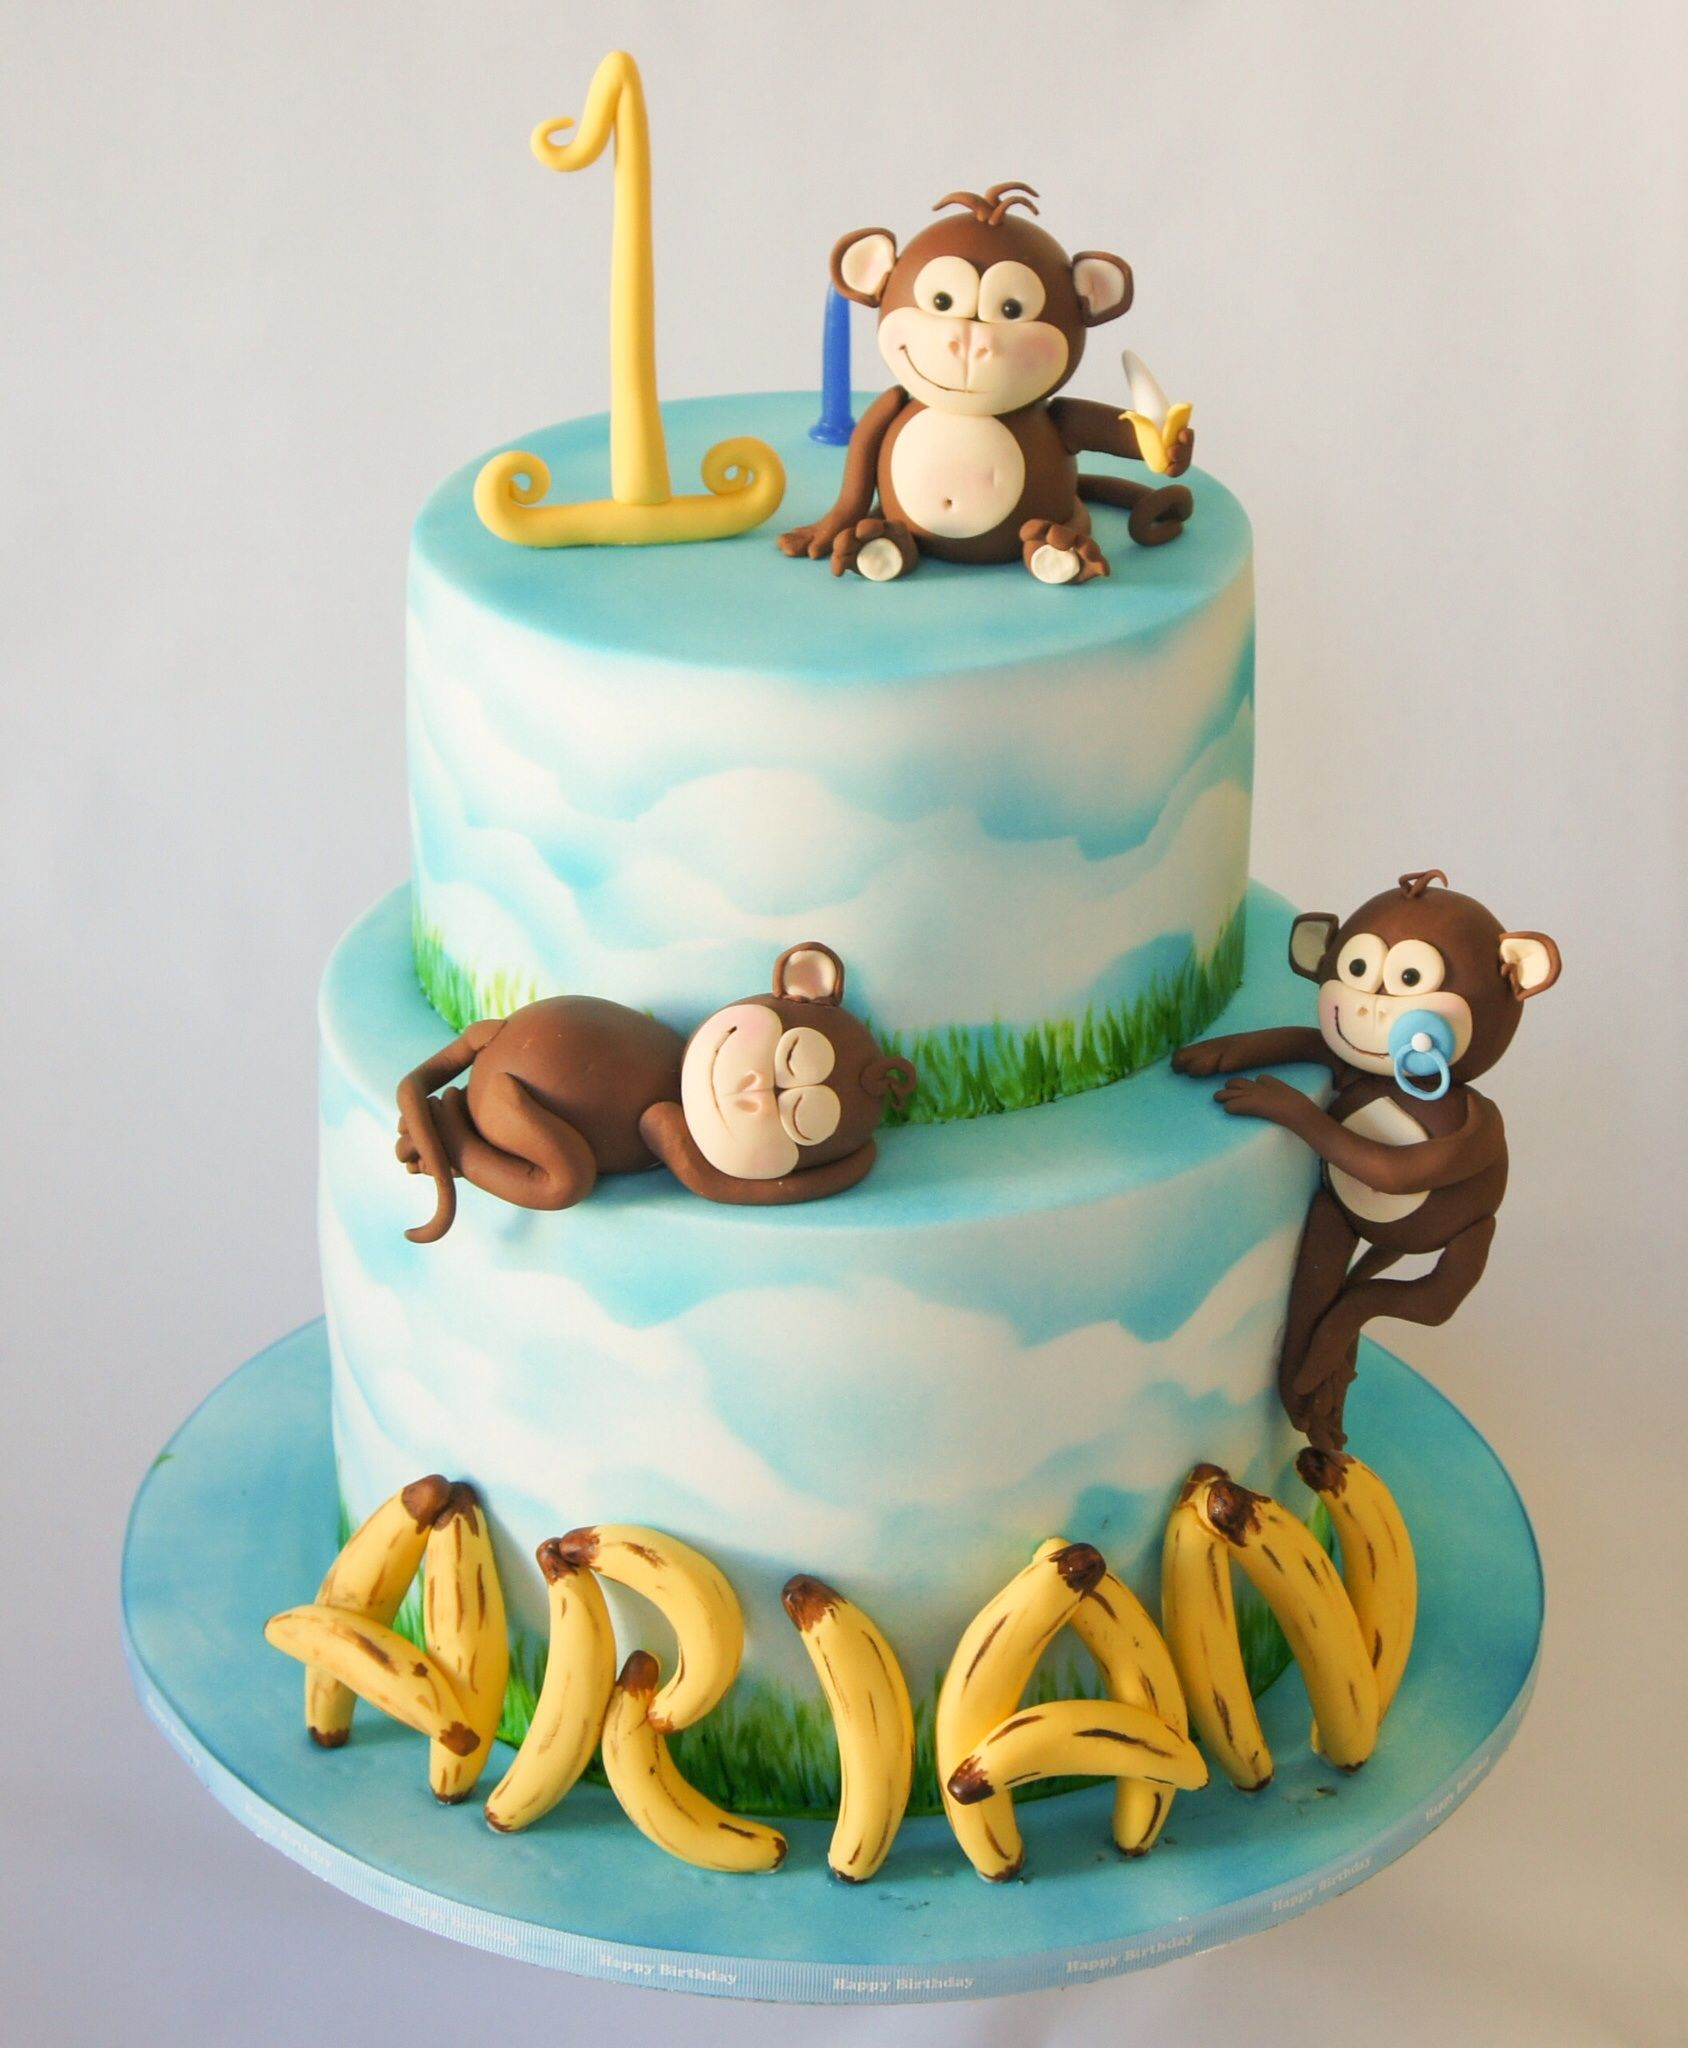 1st Birthday Monkey Cake The Cake Lovers Monkey Birthday Cakes Baby Birthday Cakes First Birthday Cakes